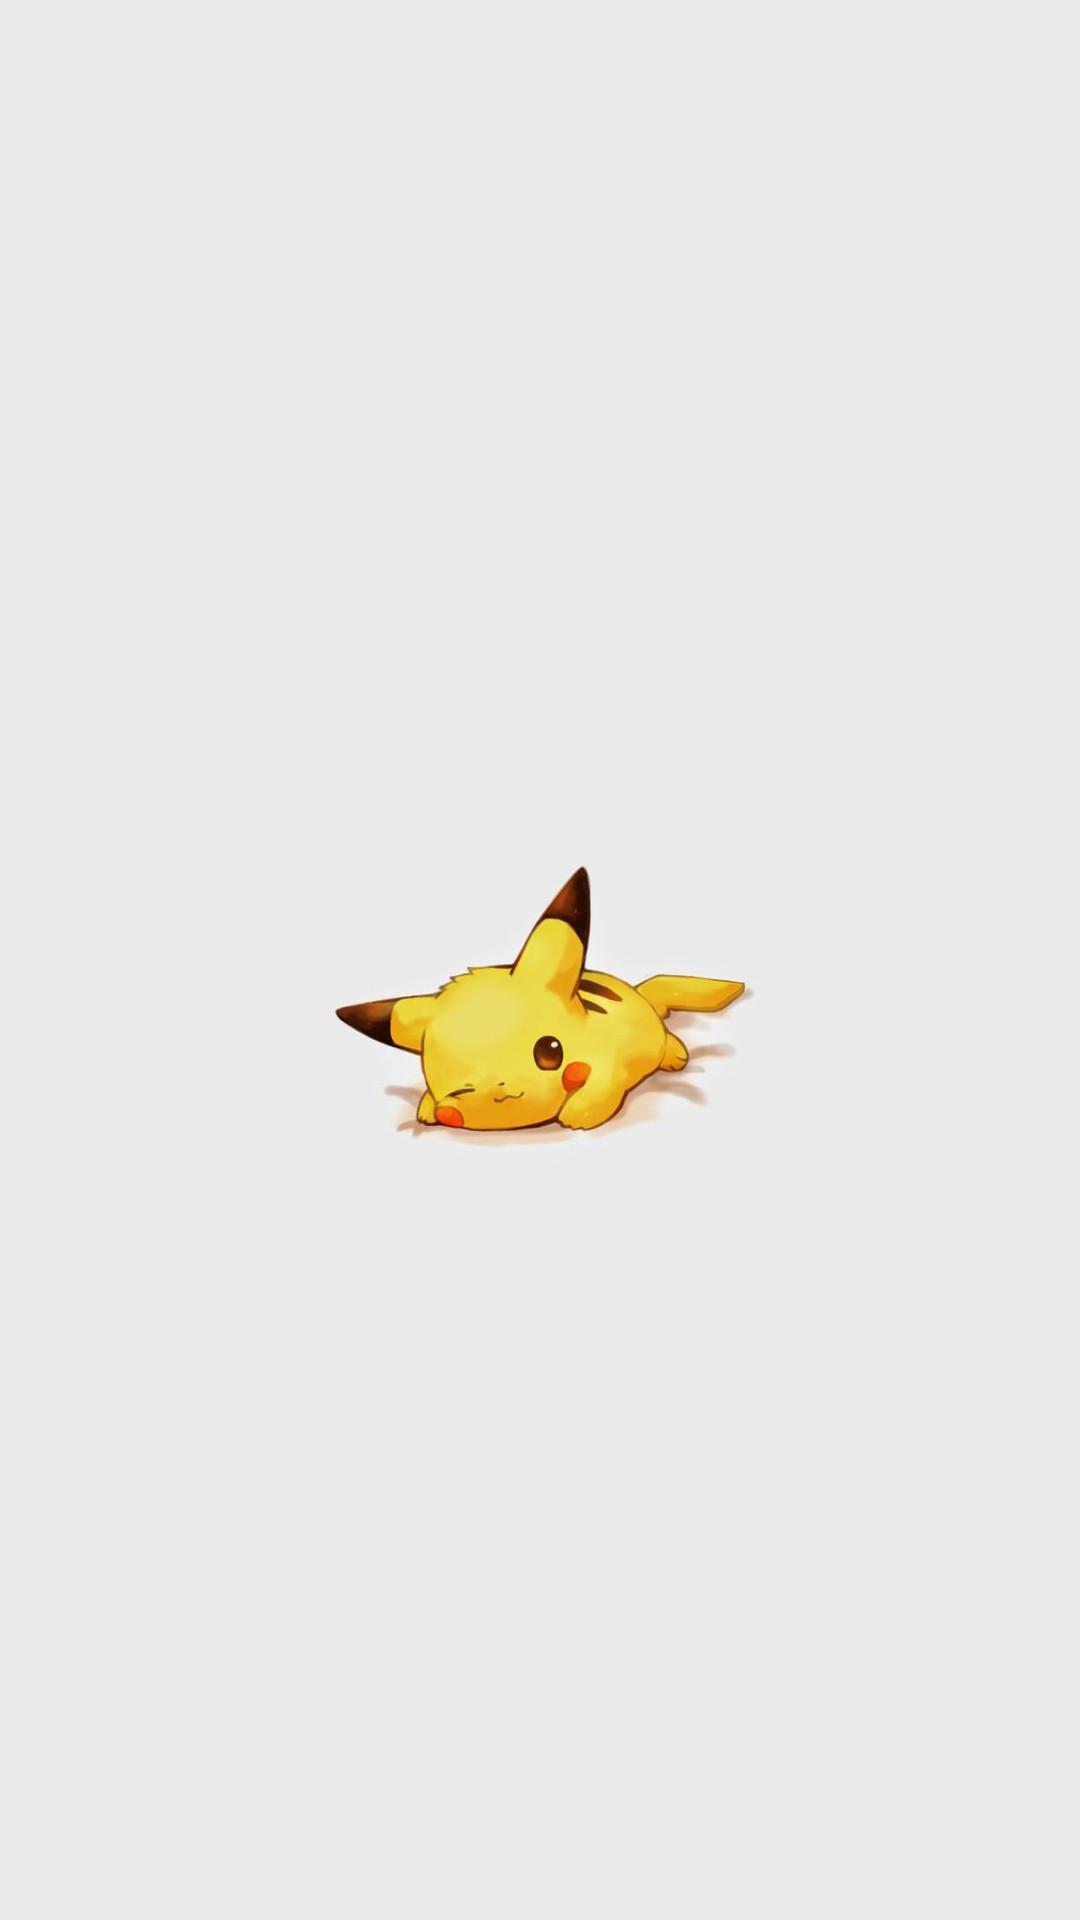 Cute Pikachu Pokemon Character iPhone 6+ HD Wallpaper –  https://freebestpicture.